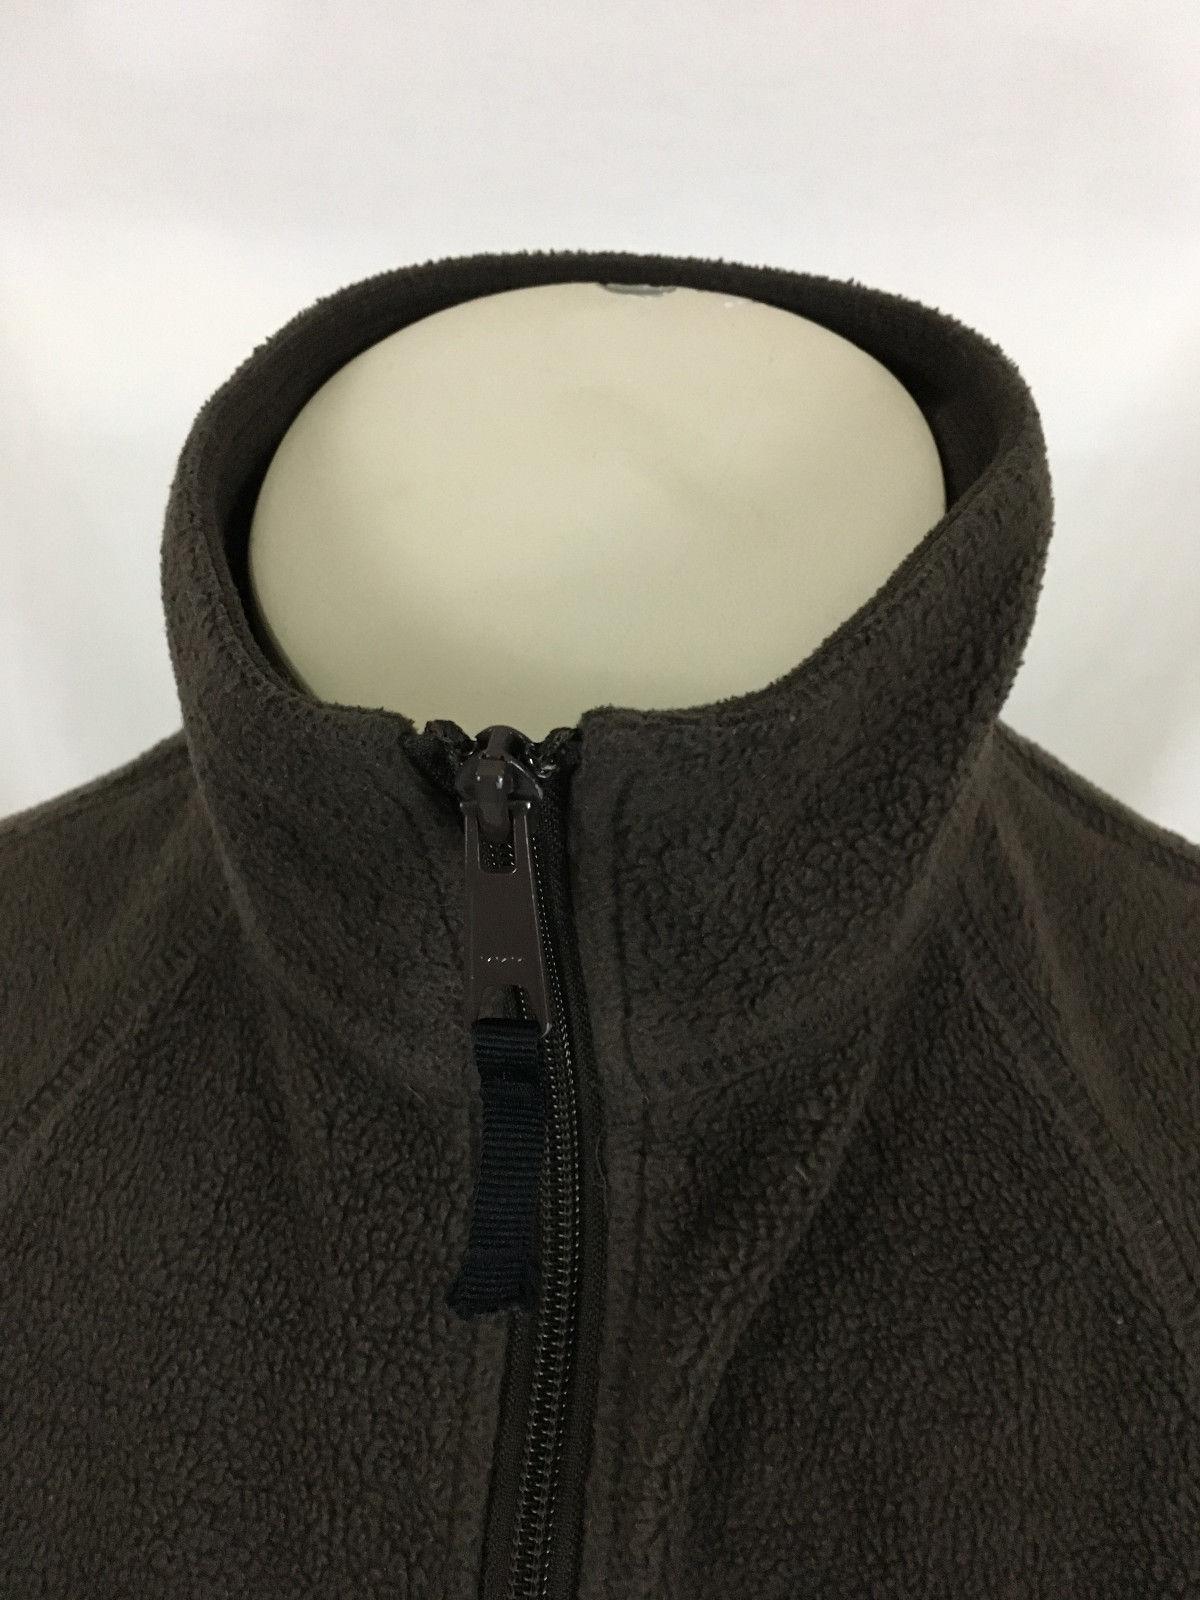 Columbia Sportswear Company Brown Fleece Vest Women's Medium